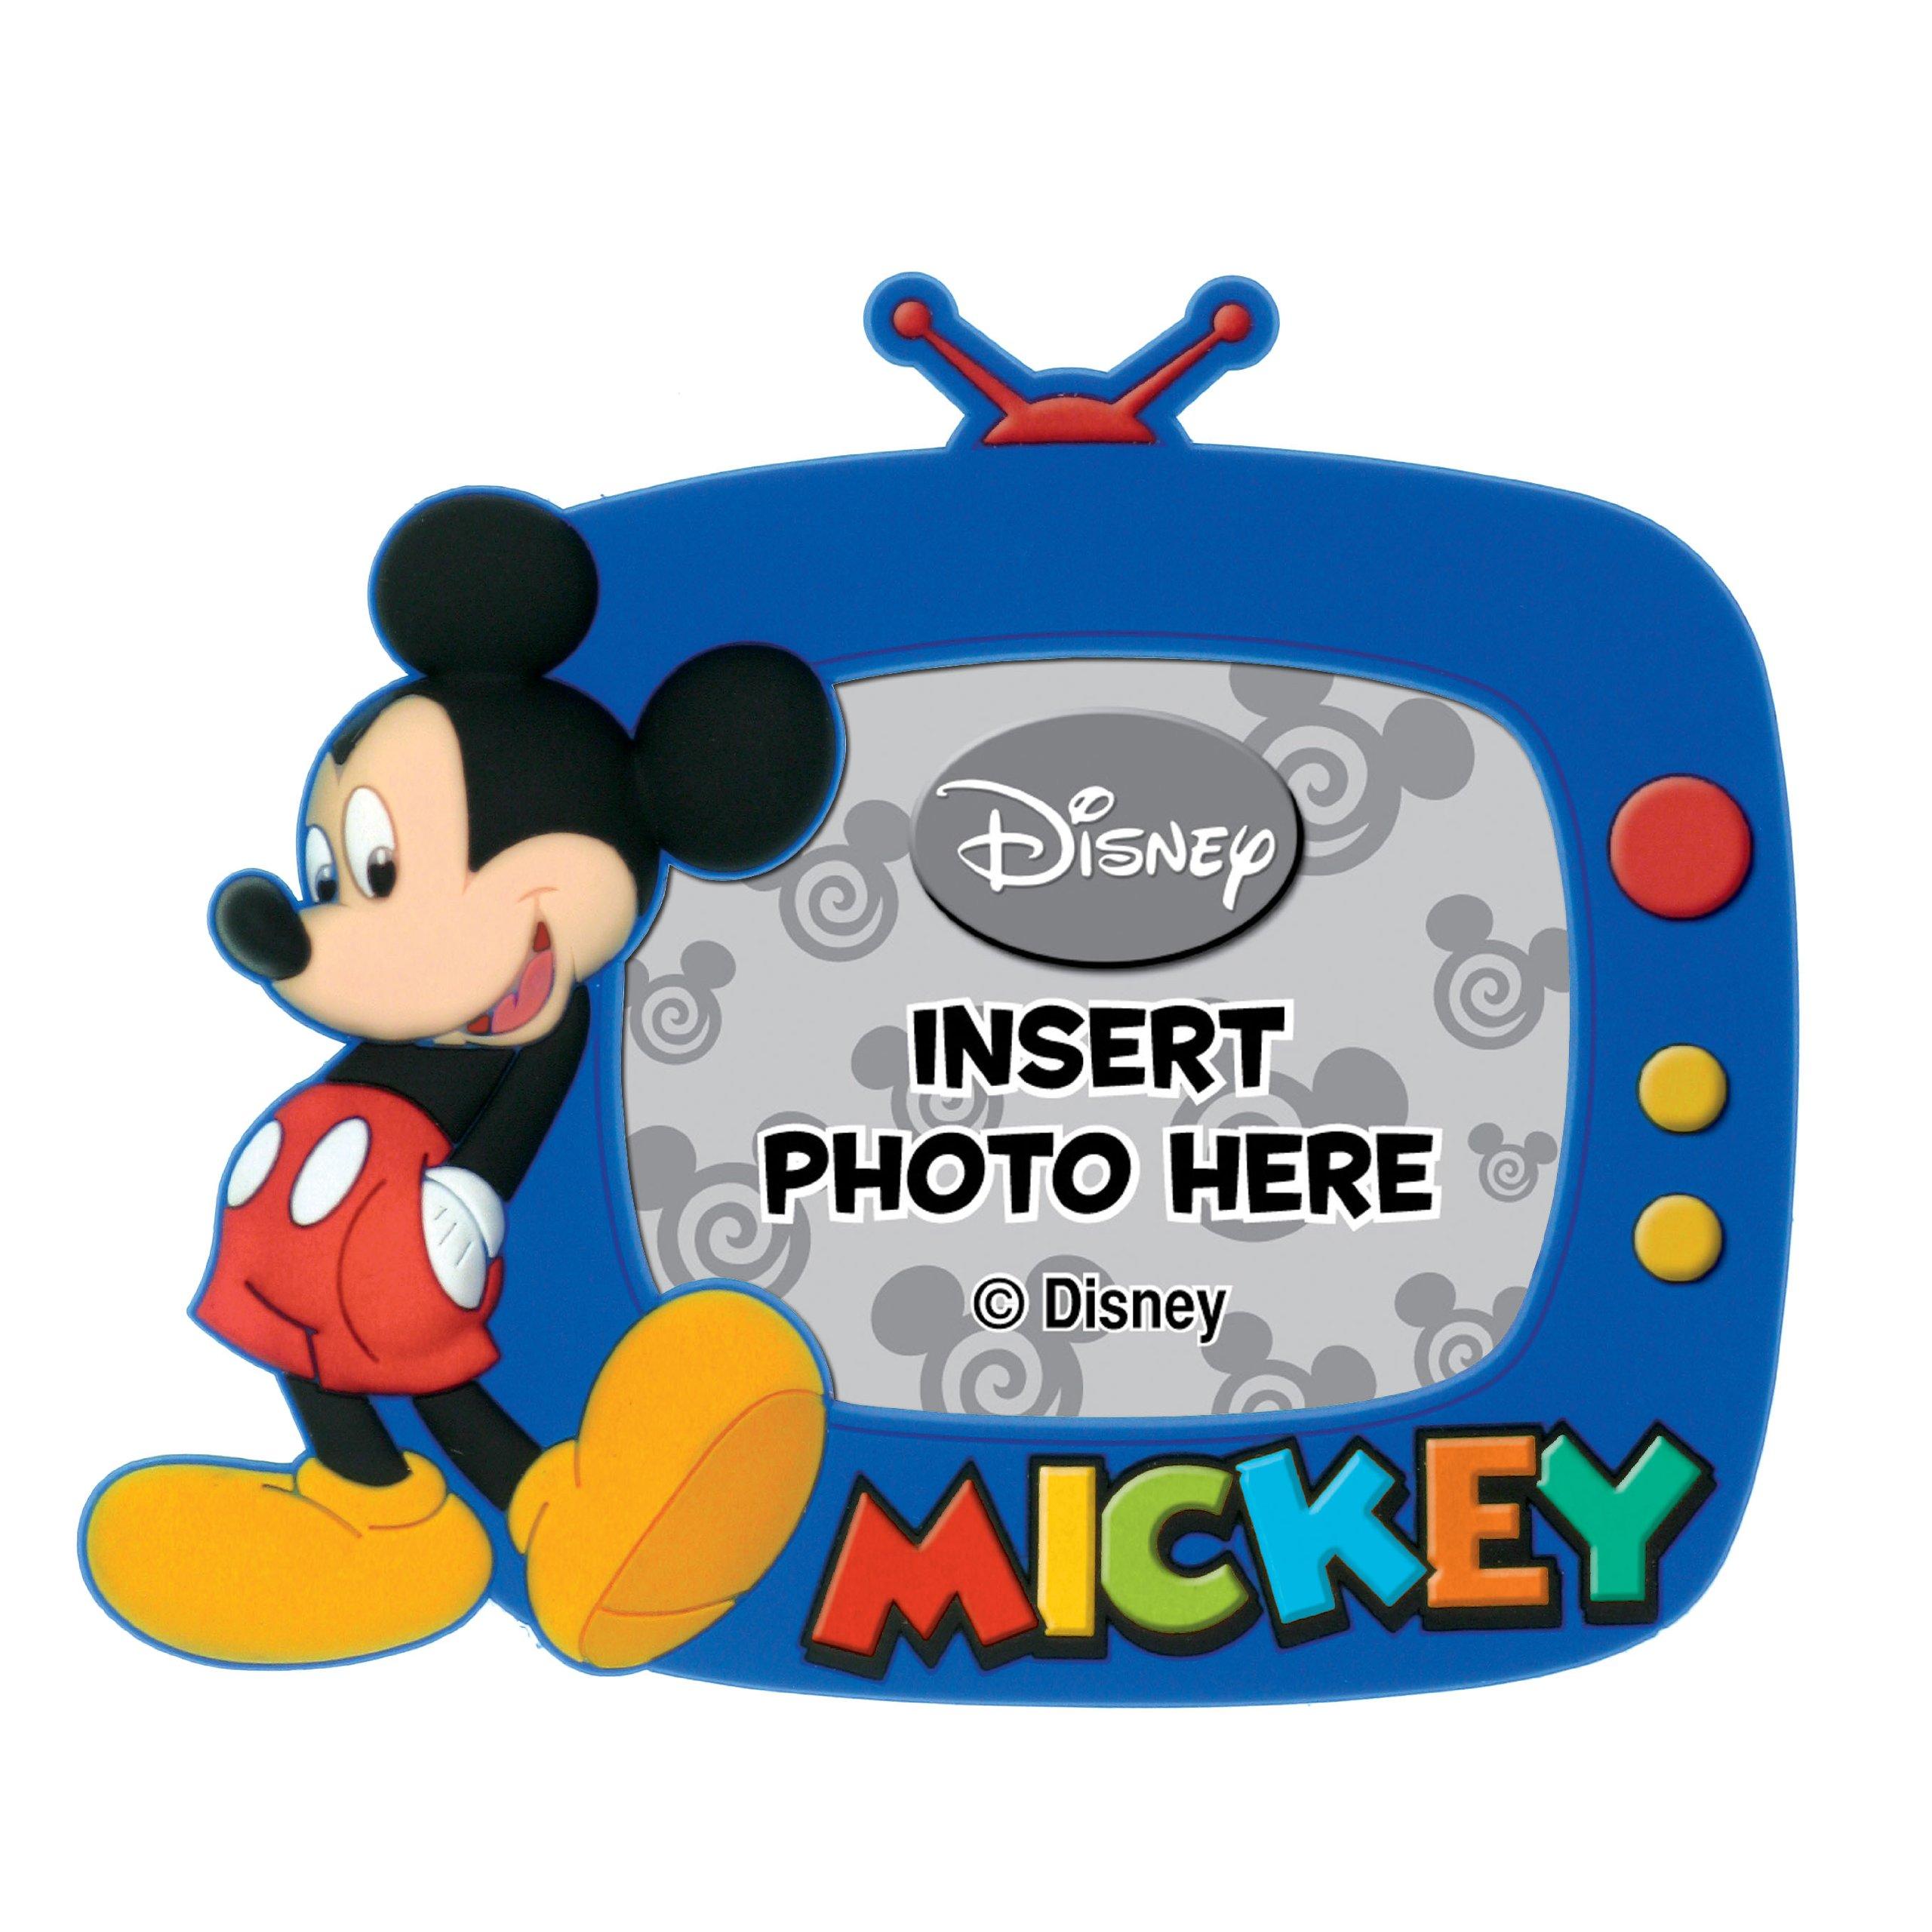 Amazoncom Disney Mickey Magnetic Photo Frame Toys Games